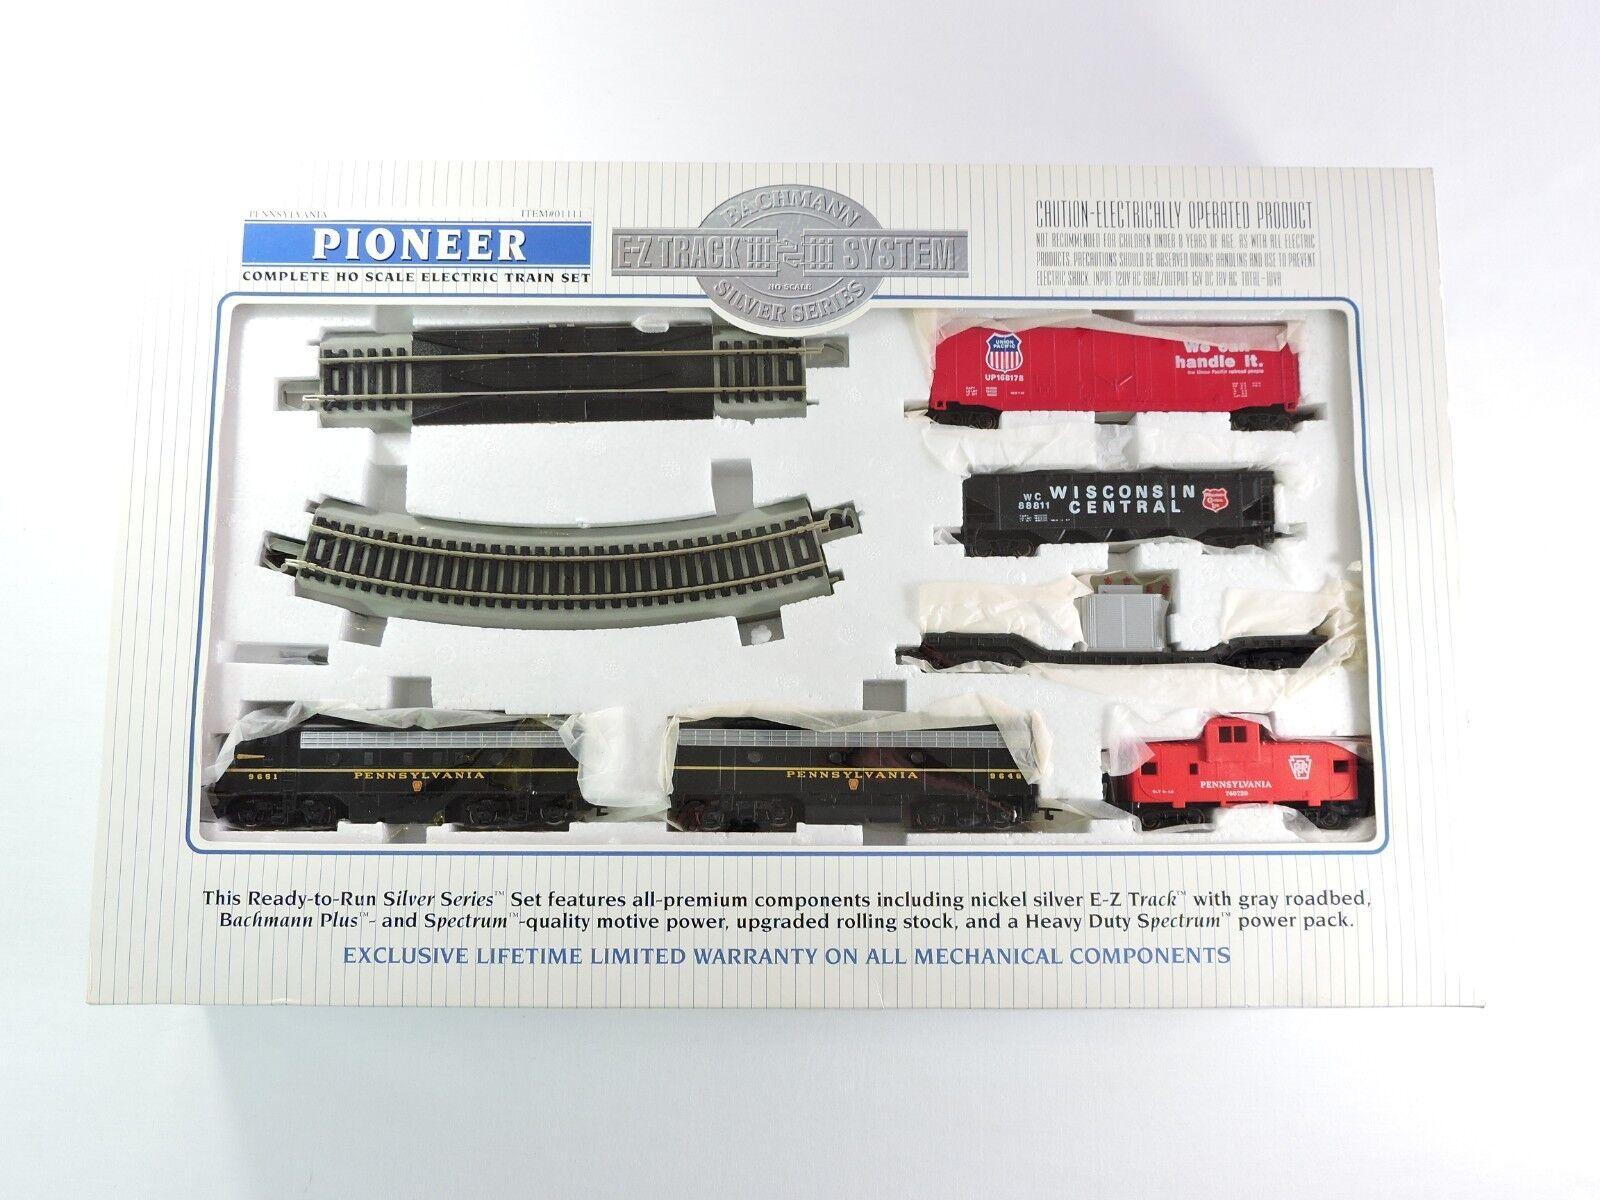 Bachuomon argento SERIE COMPLETA Pioneer pennsylvania HO Treno Set 01111 EZ Up